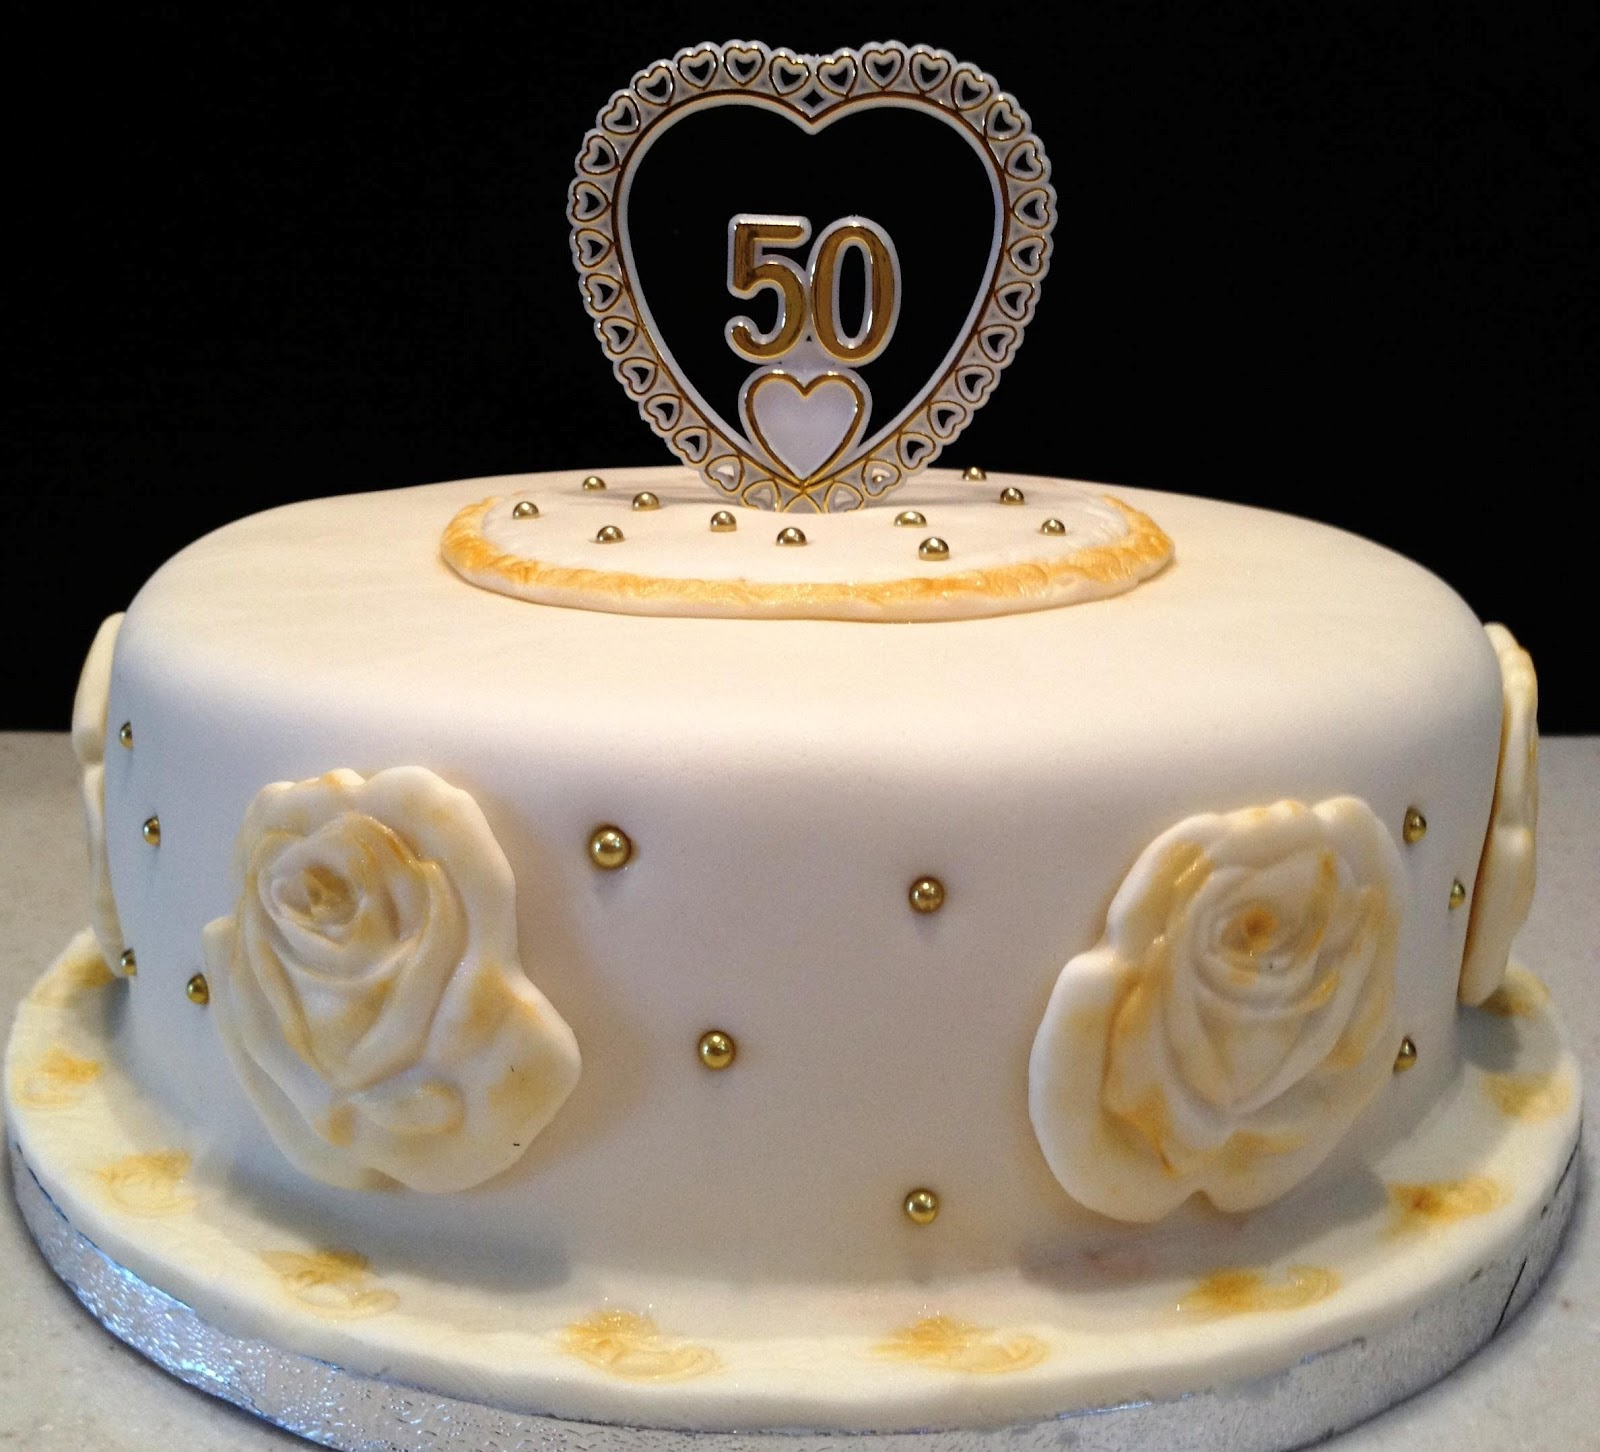 50th Wedding Anniversary Cakes: MaryMel Cakes: 50th Wedding Anniversary